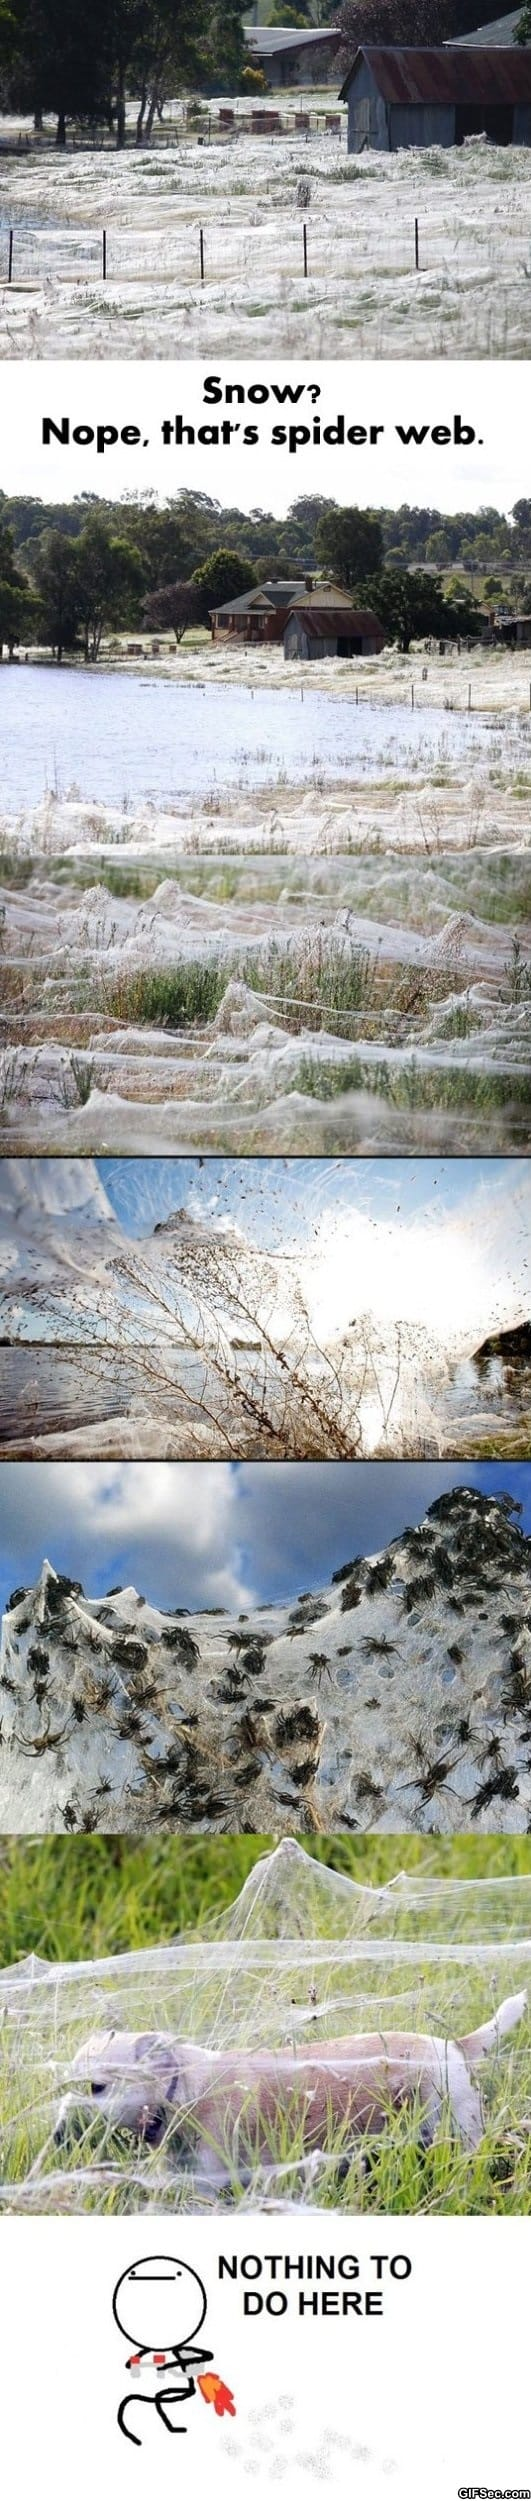 Damn nature - you scary